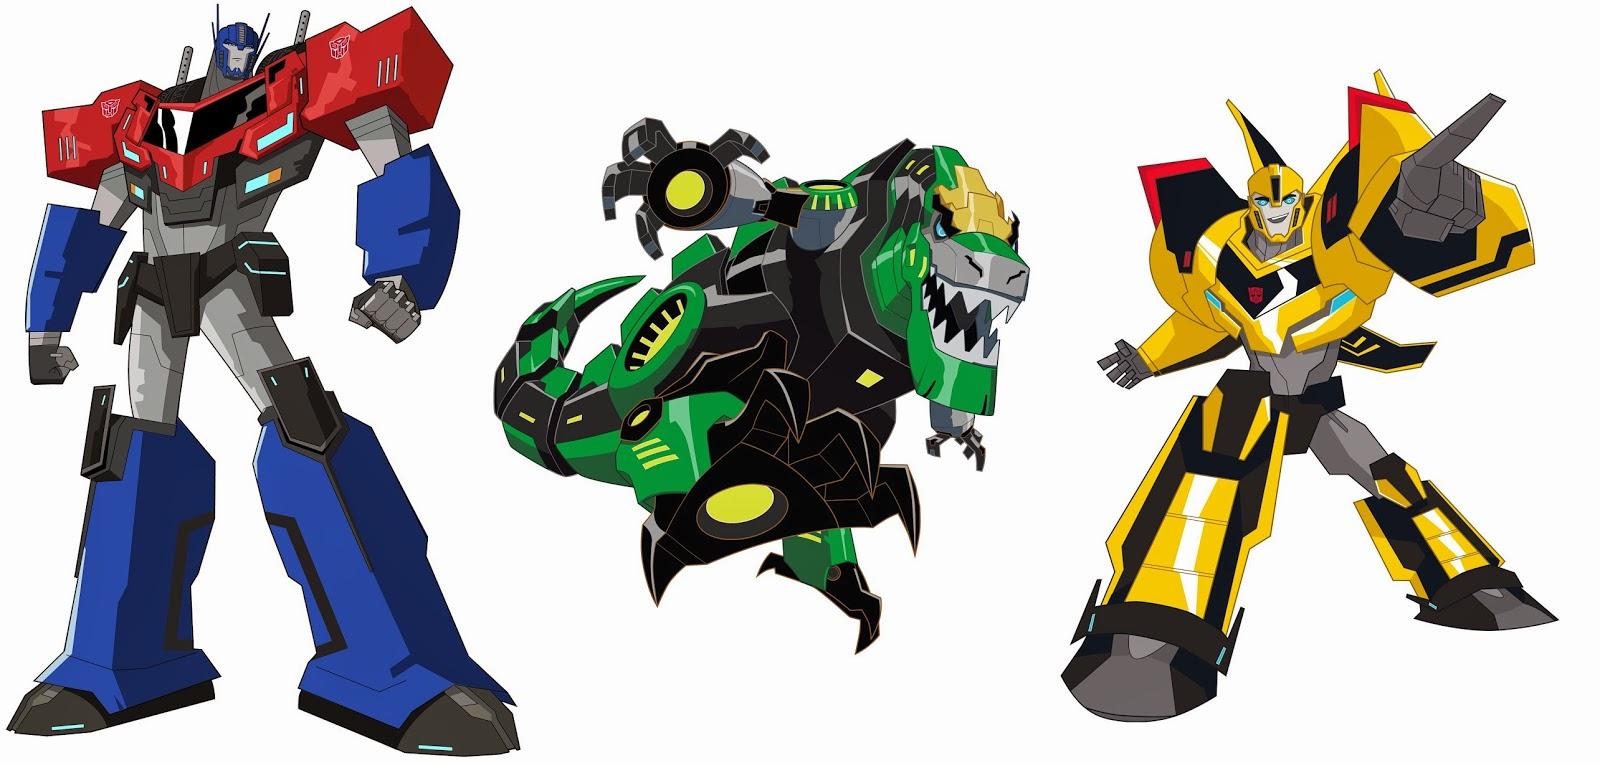 Optimus Prime Bumblebee Grimlock Con Nesquik Cookie Crisp in regalo Transformers nuova promozione Nestle